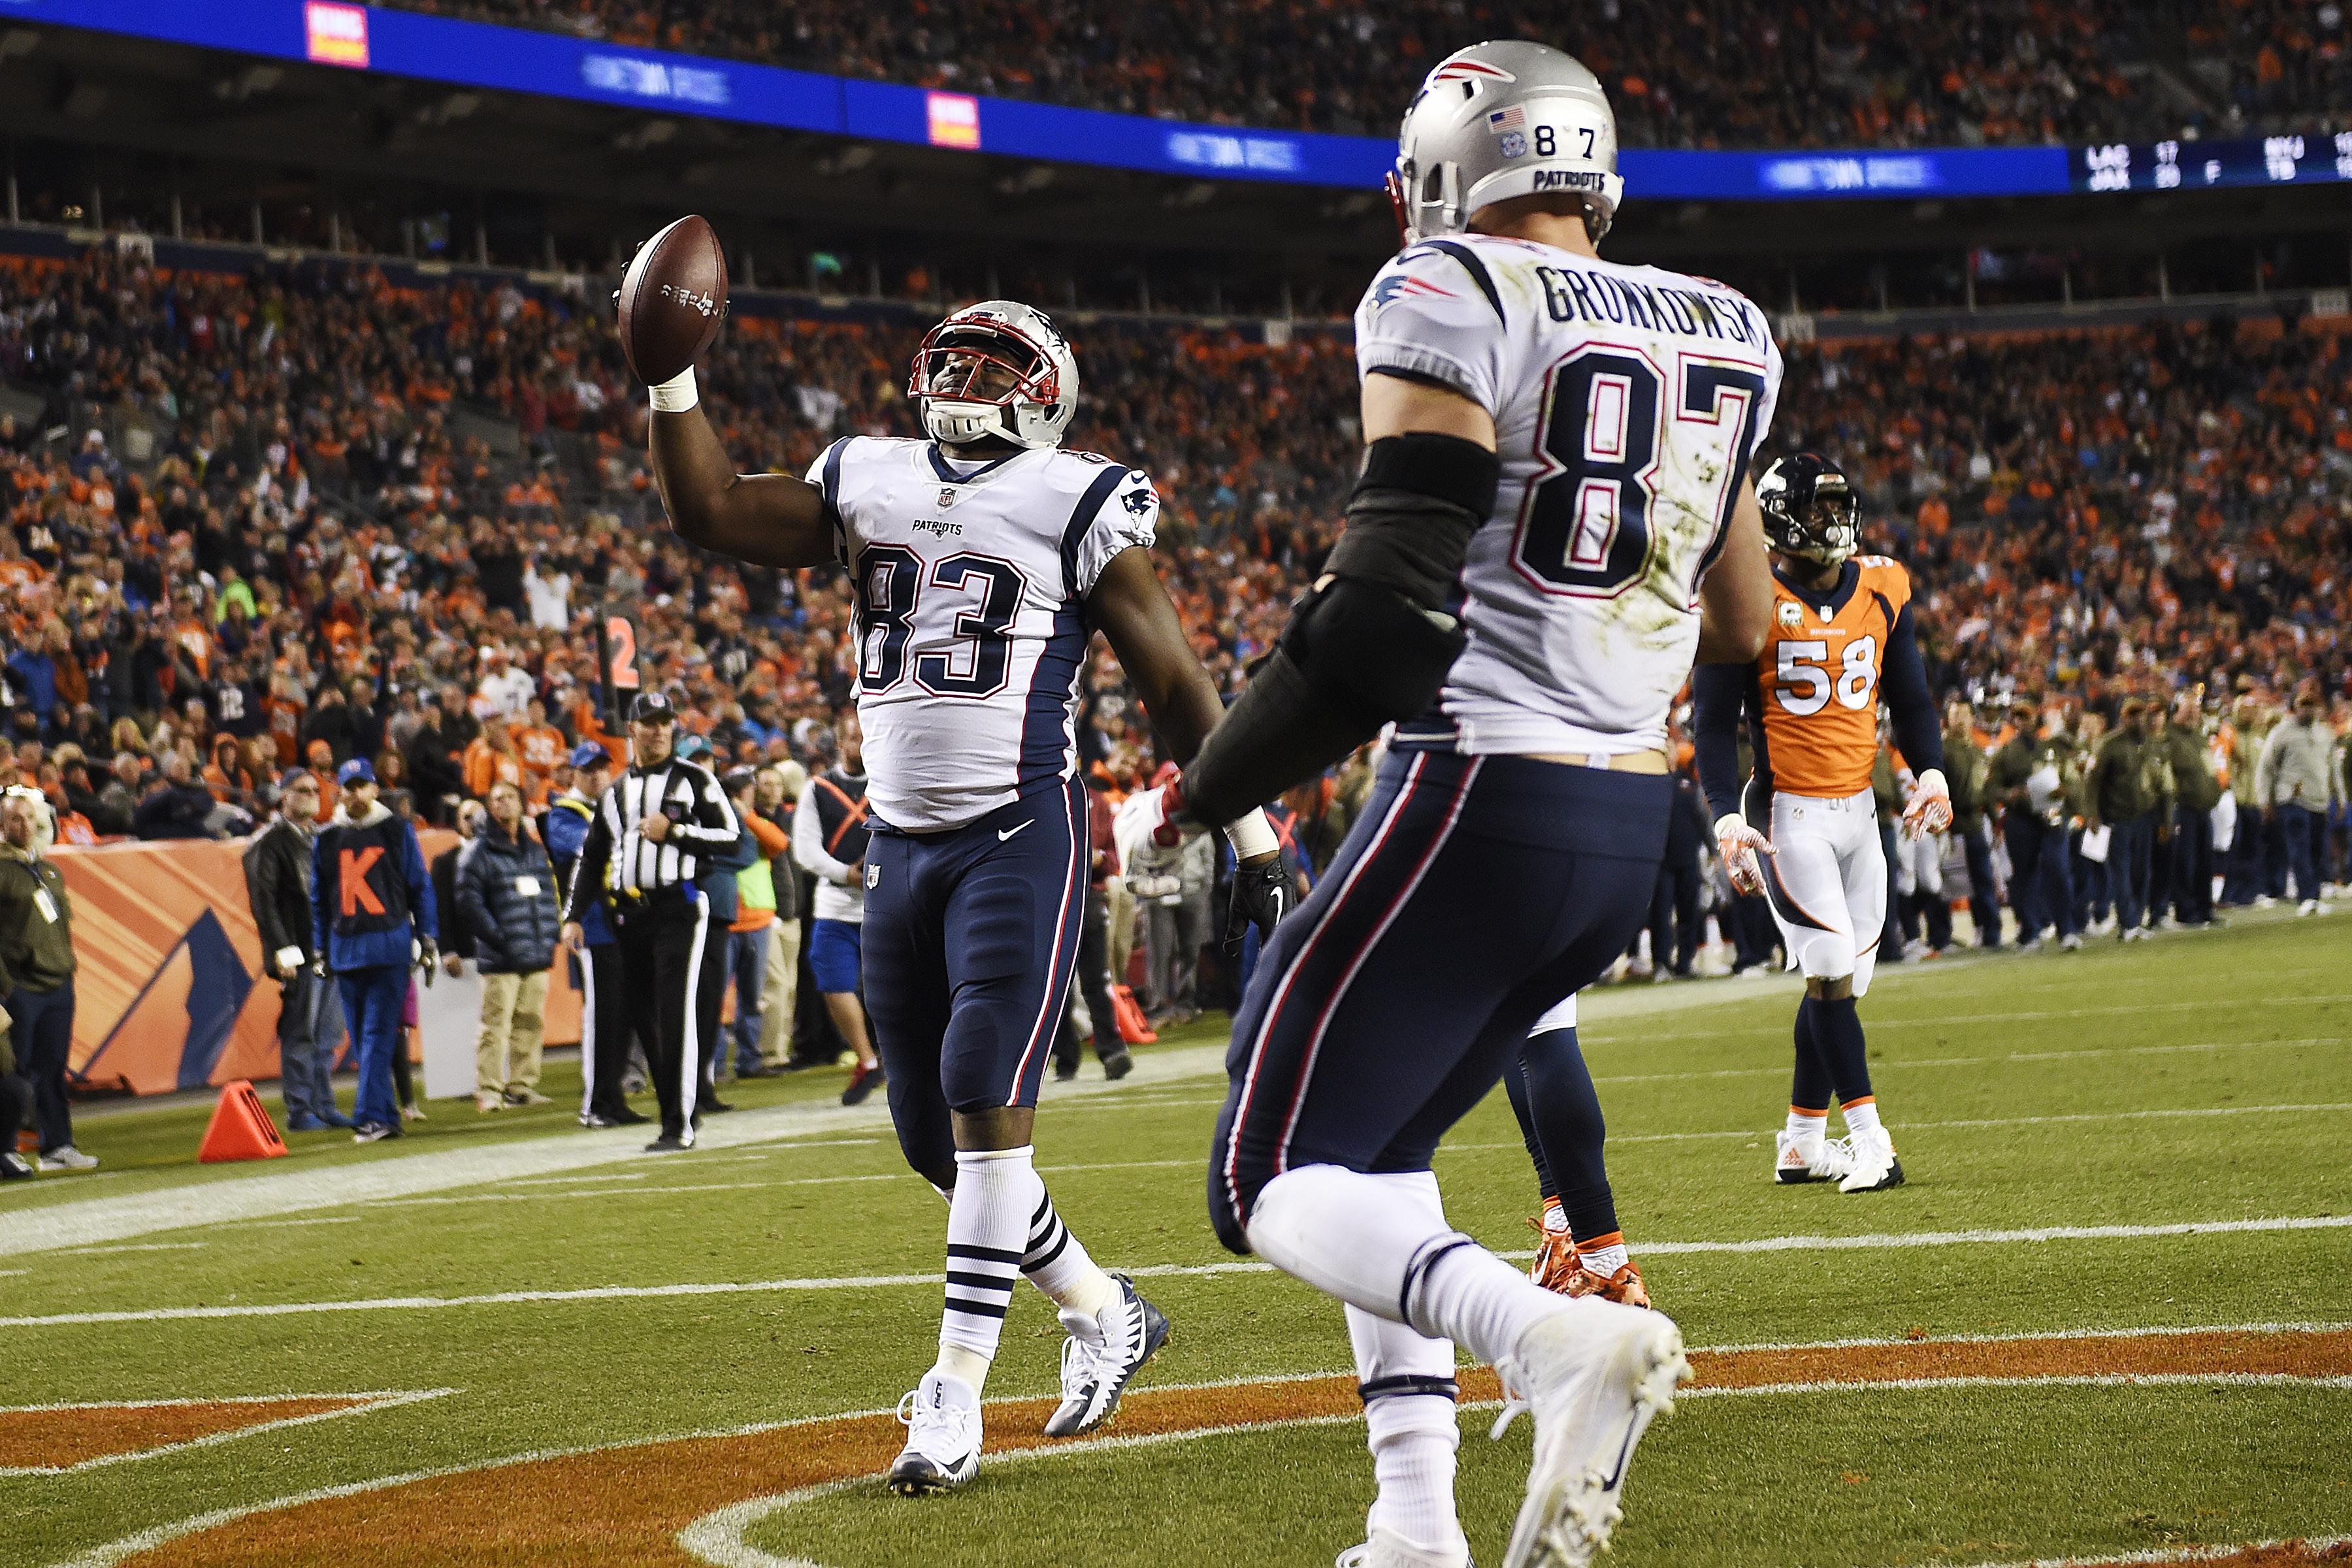 Denver Broncos vs. against the New England Patriots, NFL Week 10